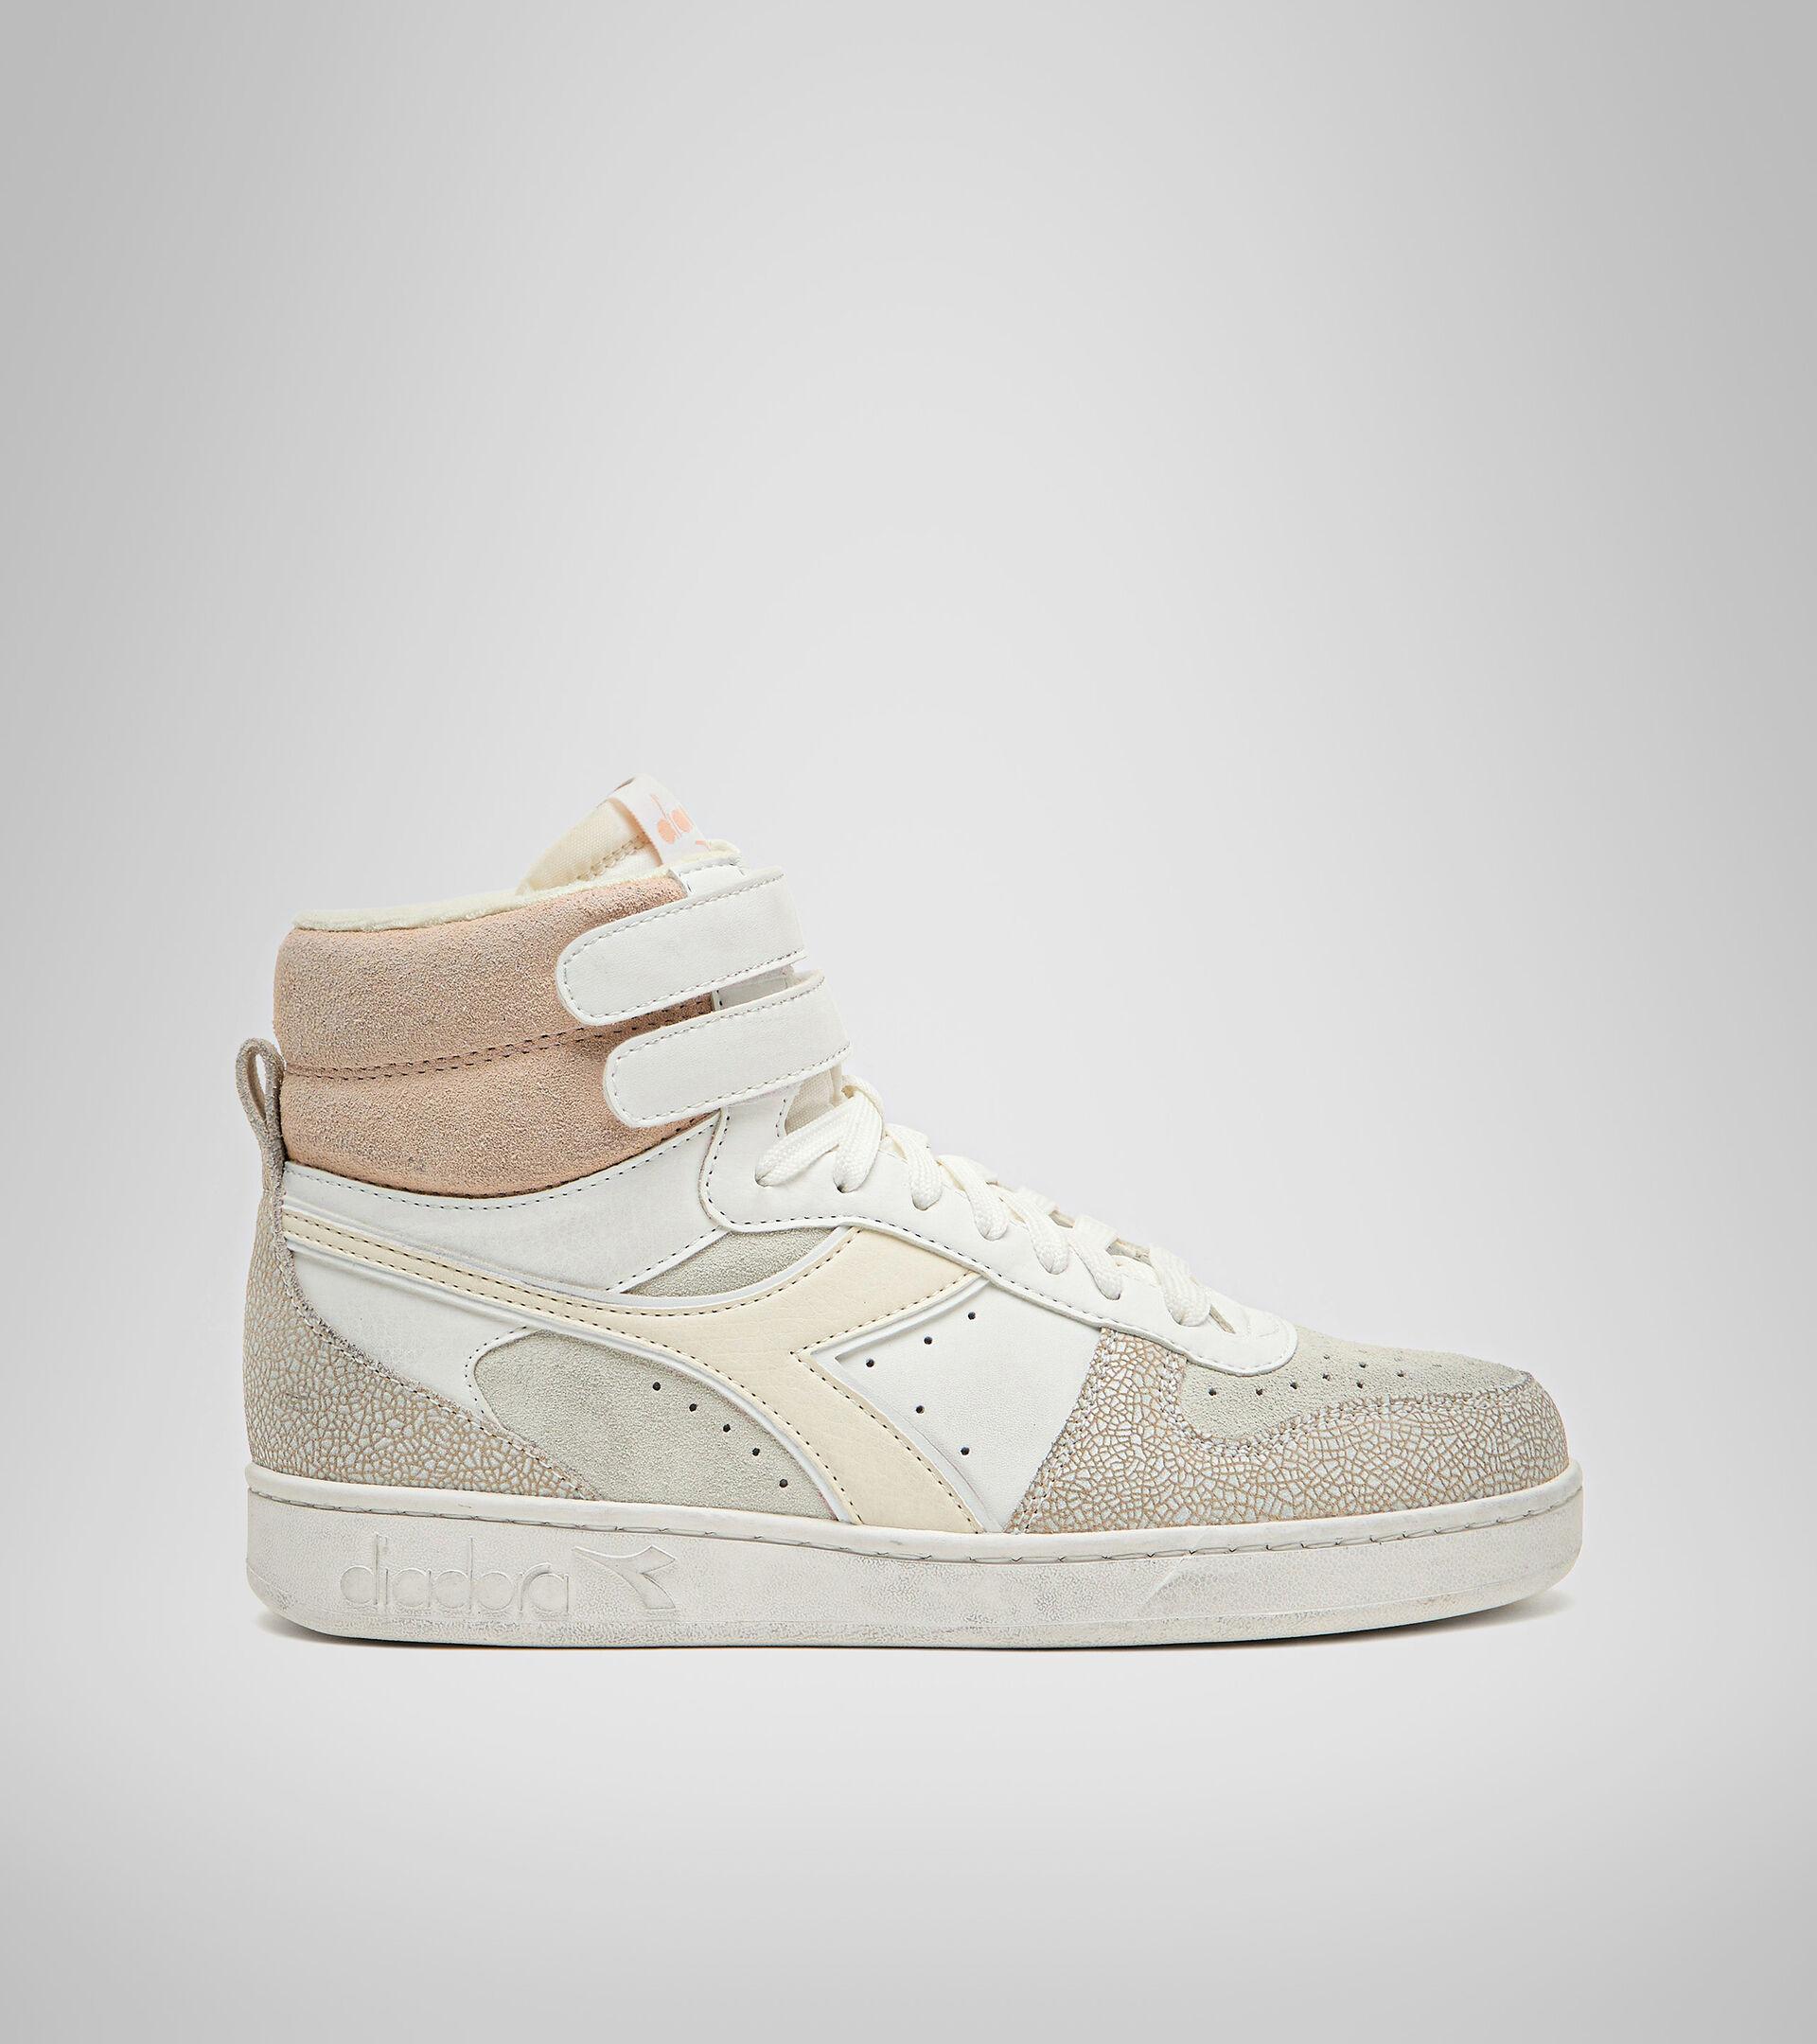 Footwear Sportswear DONNA MAGIC BASKET MID ICONA WN BLANCO MURMURAR Diadora